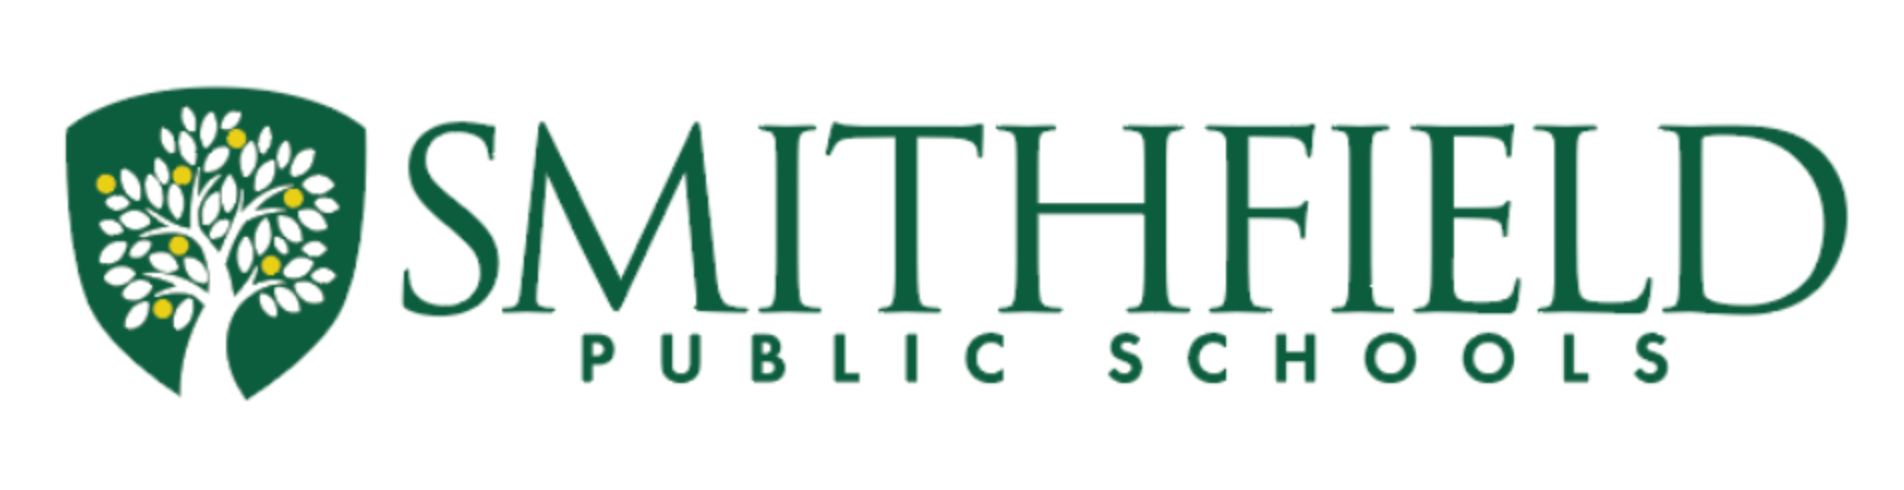 Smithfield Public Schools logo